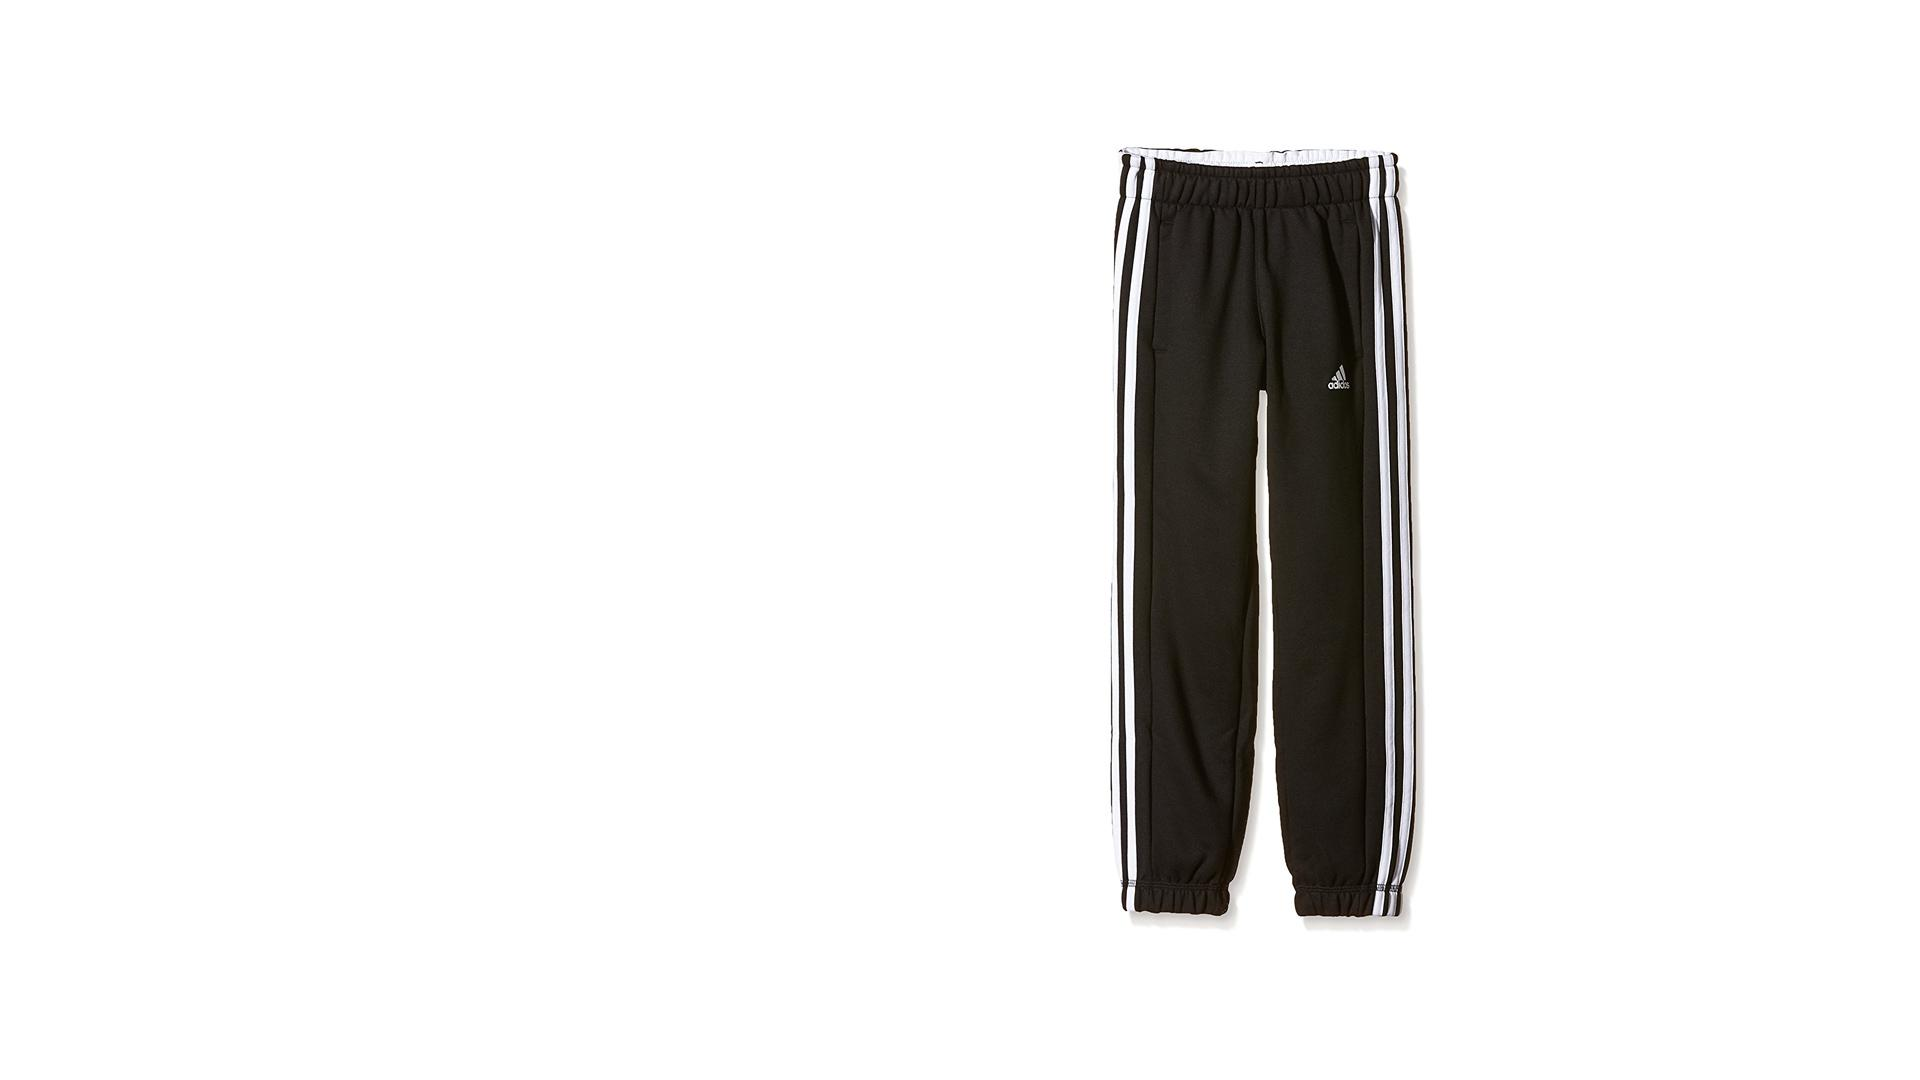 3-Stripes Pants - Lady Leshurr - Juice